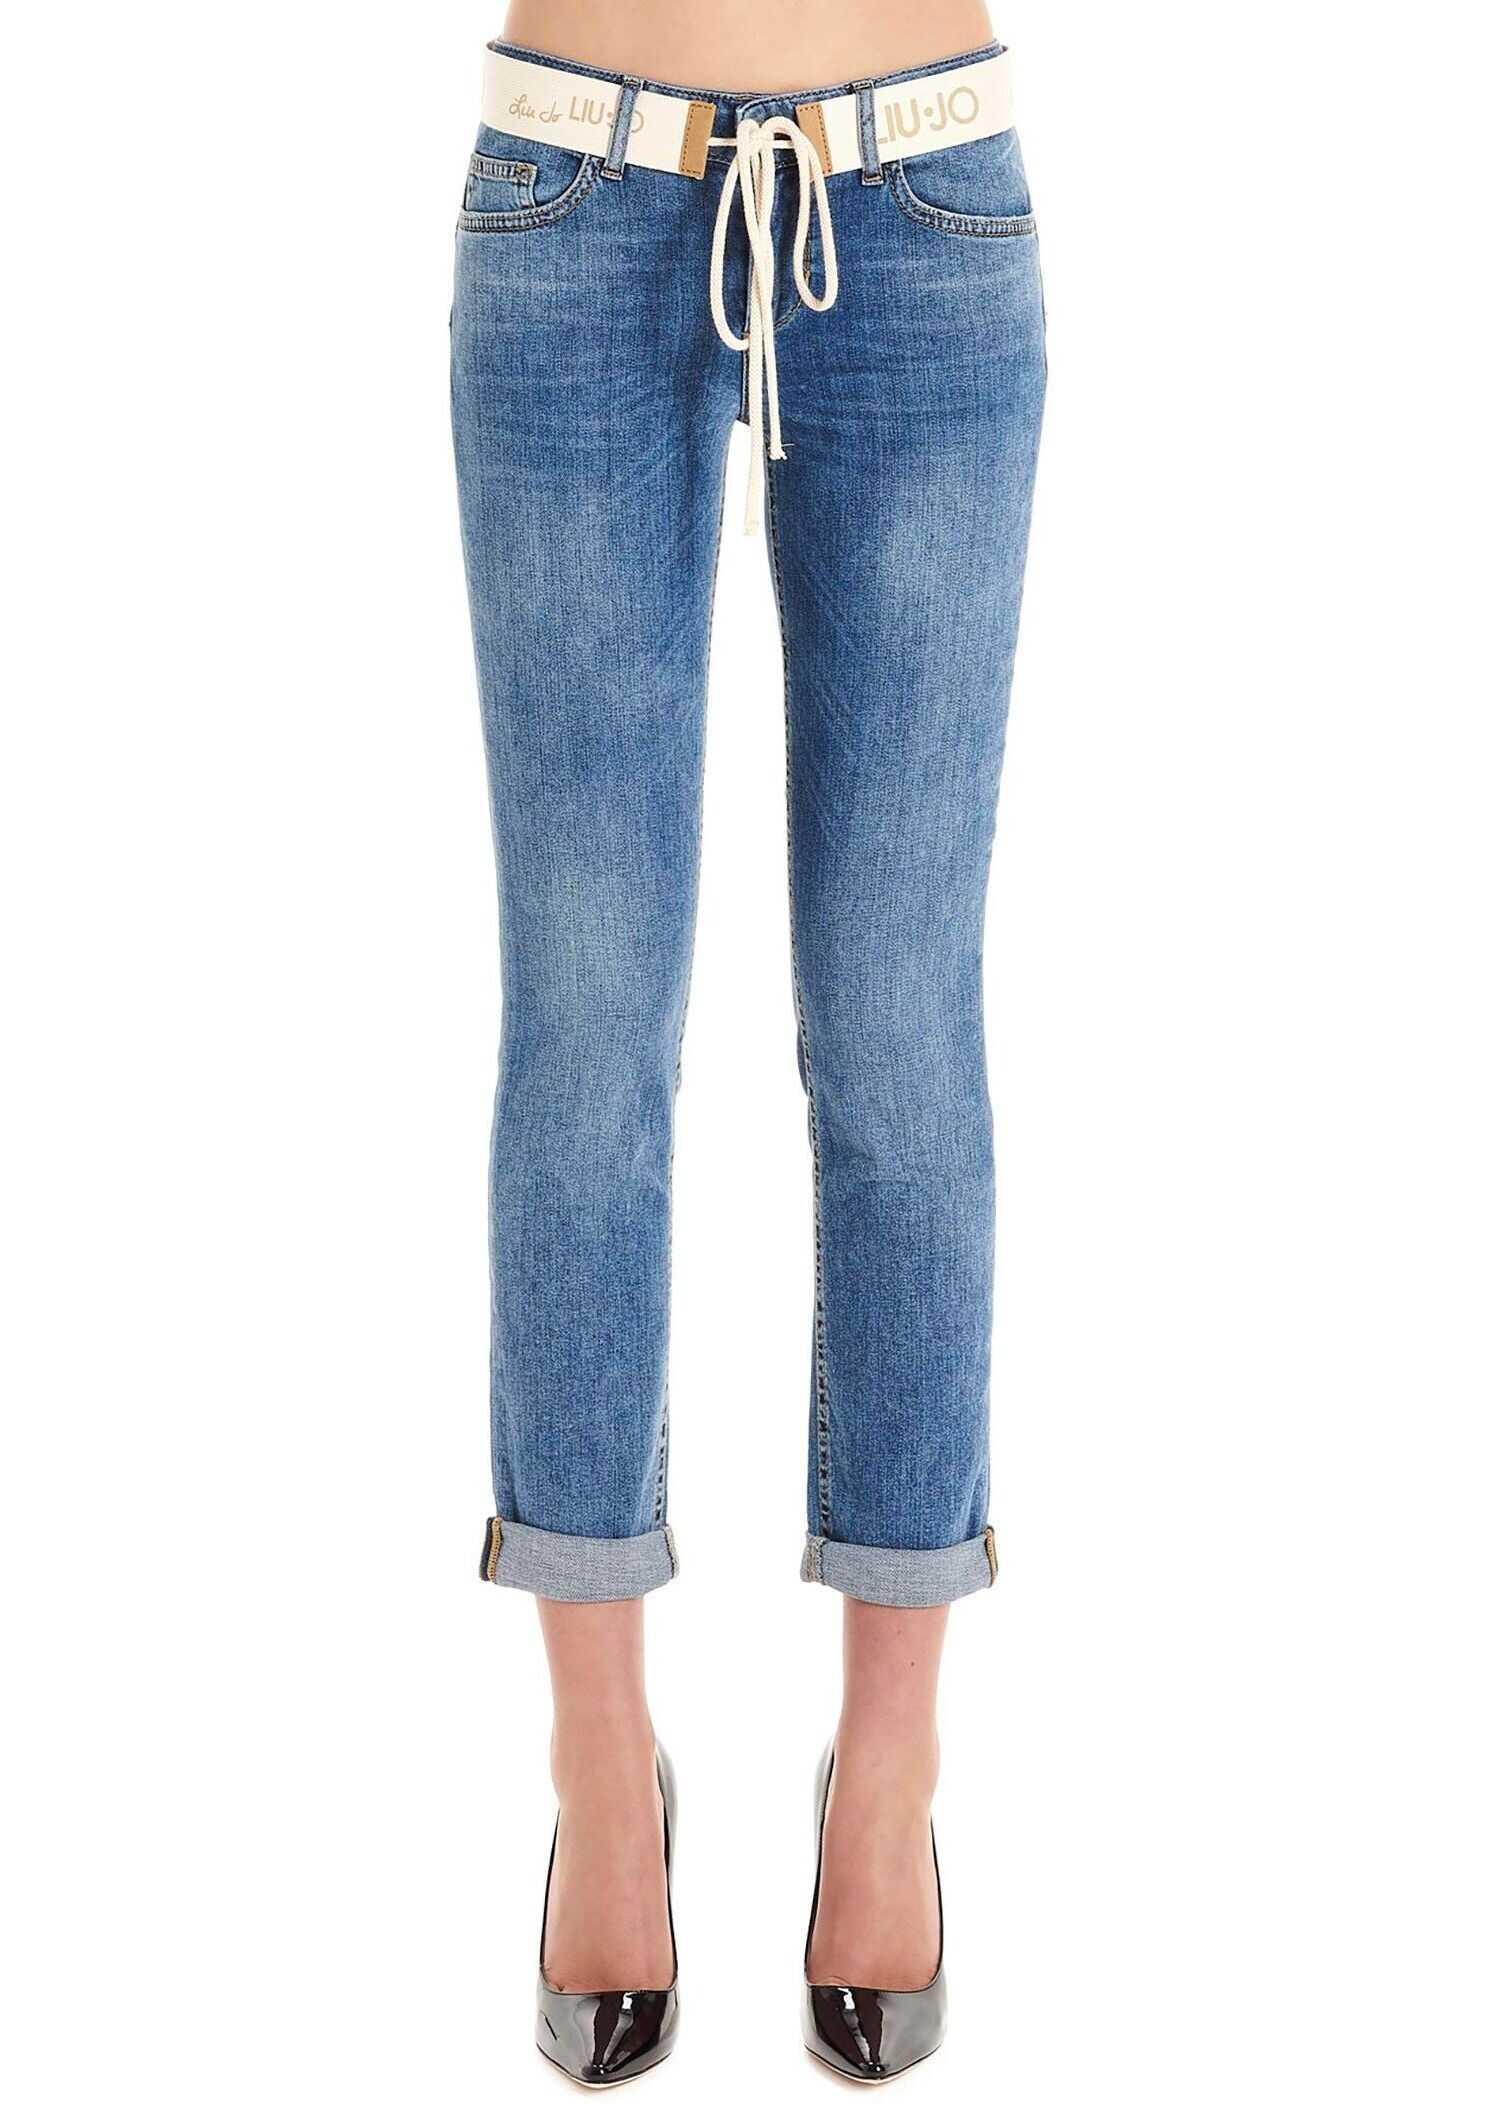 Liu Jo Cotton Jeans BLUE